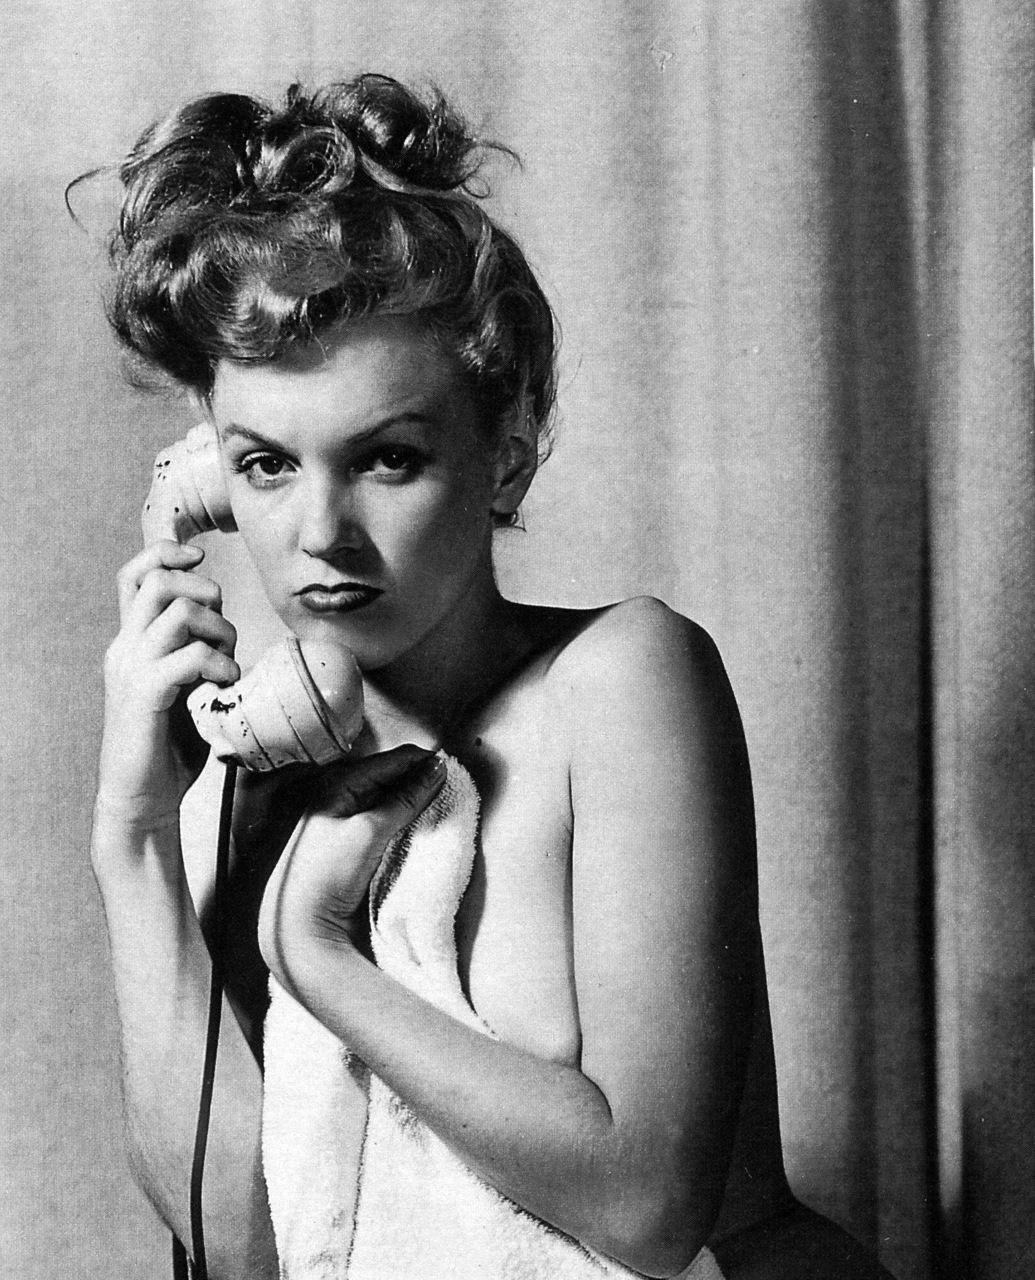 Marilyn Monroe by Earl Moran prof the messy bun has always been